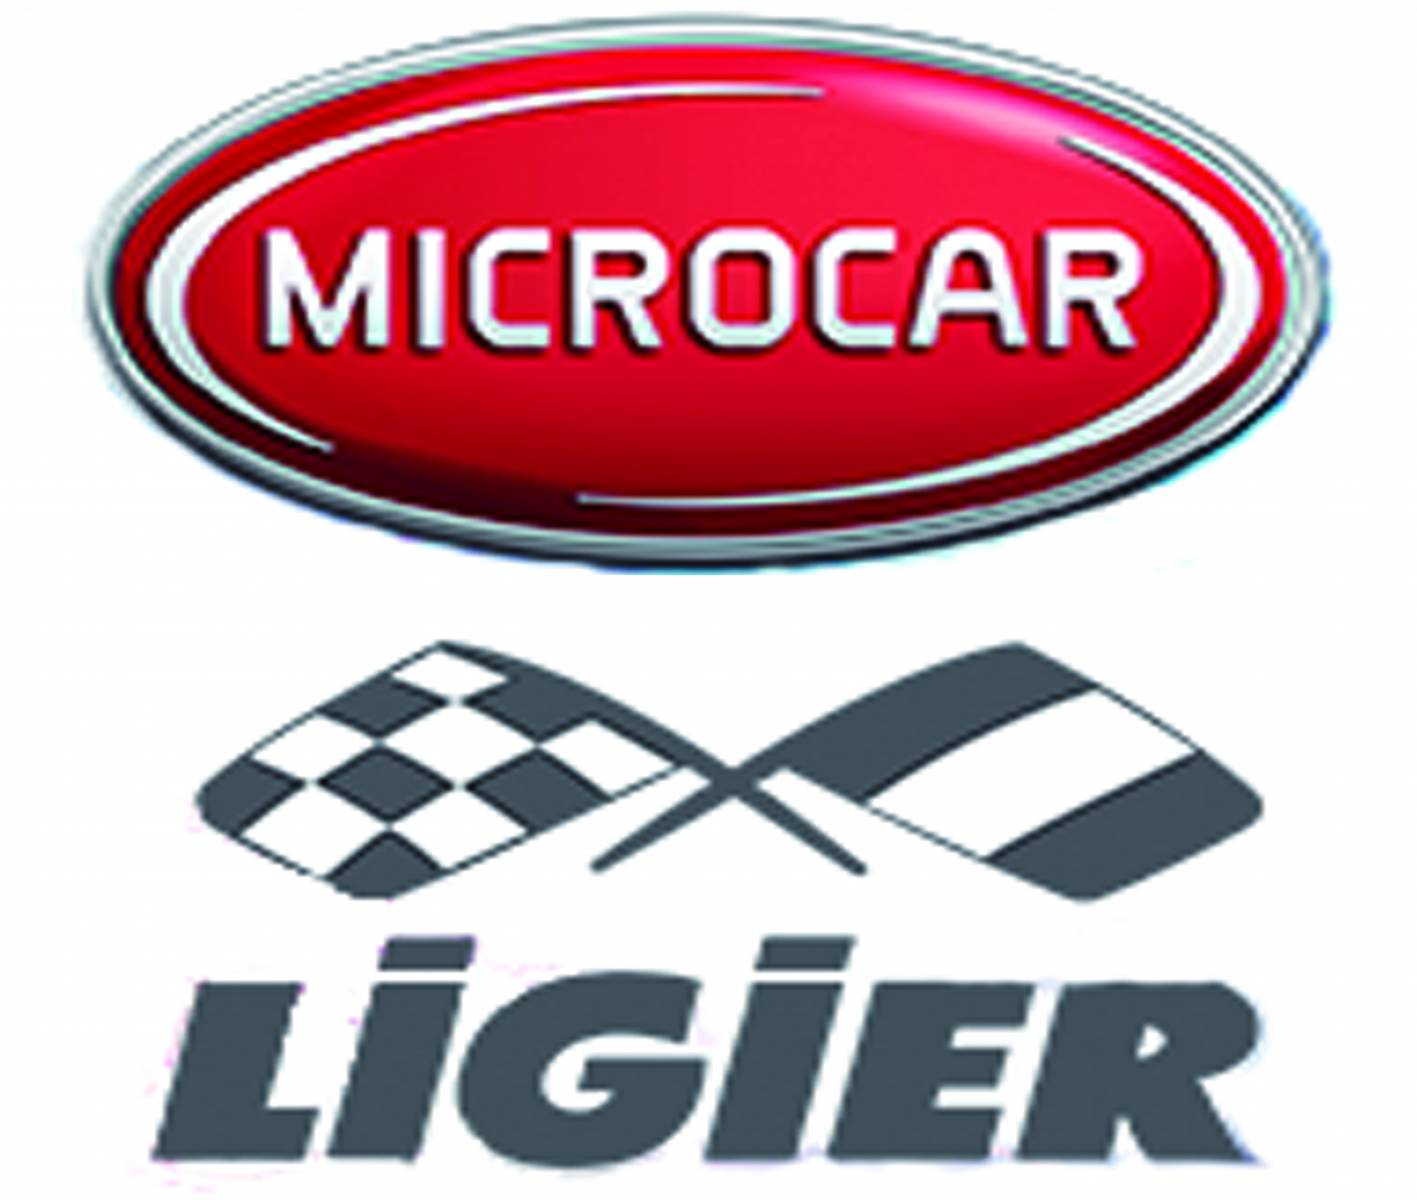 LIGIER / MICROCAR